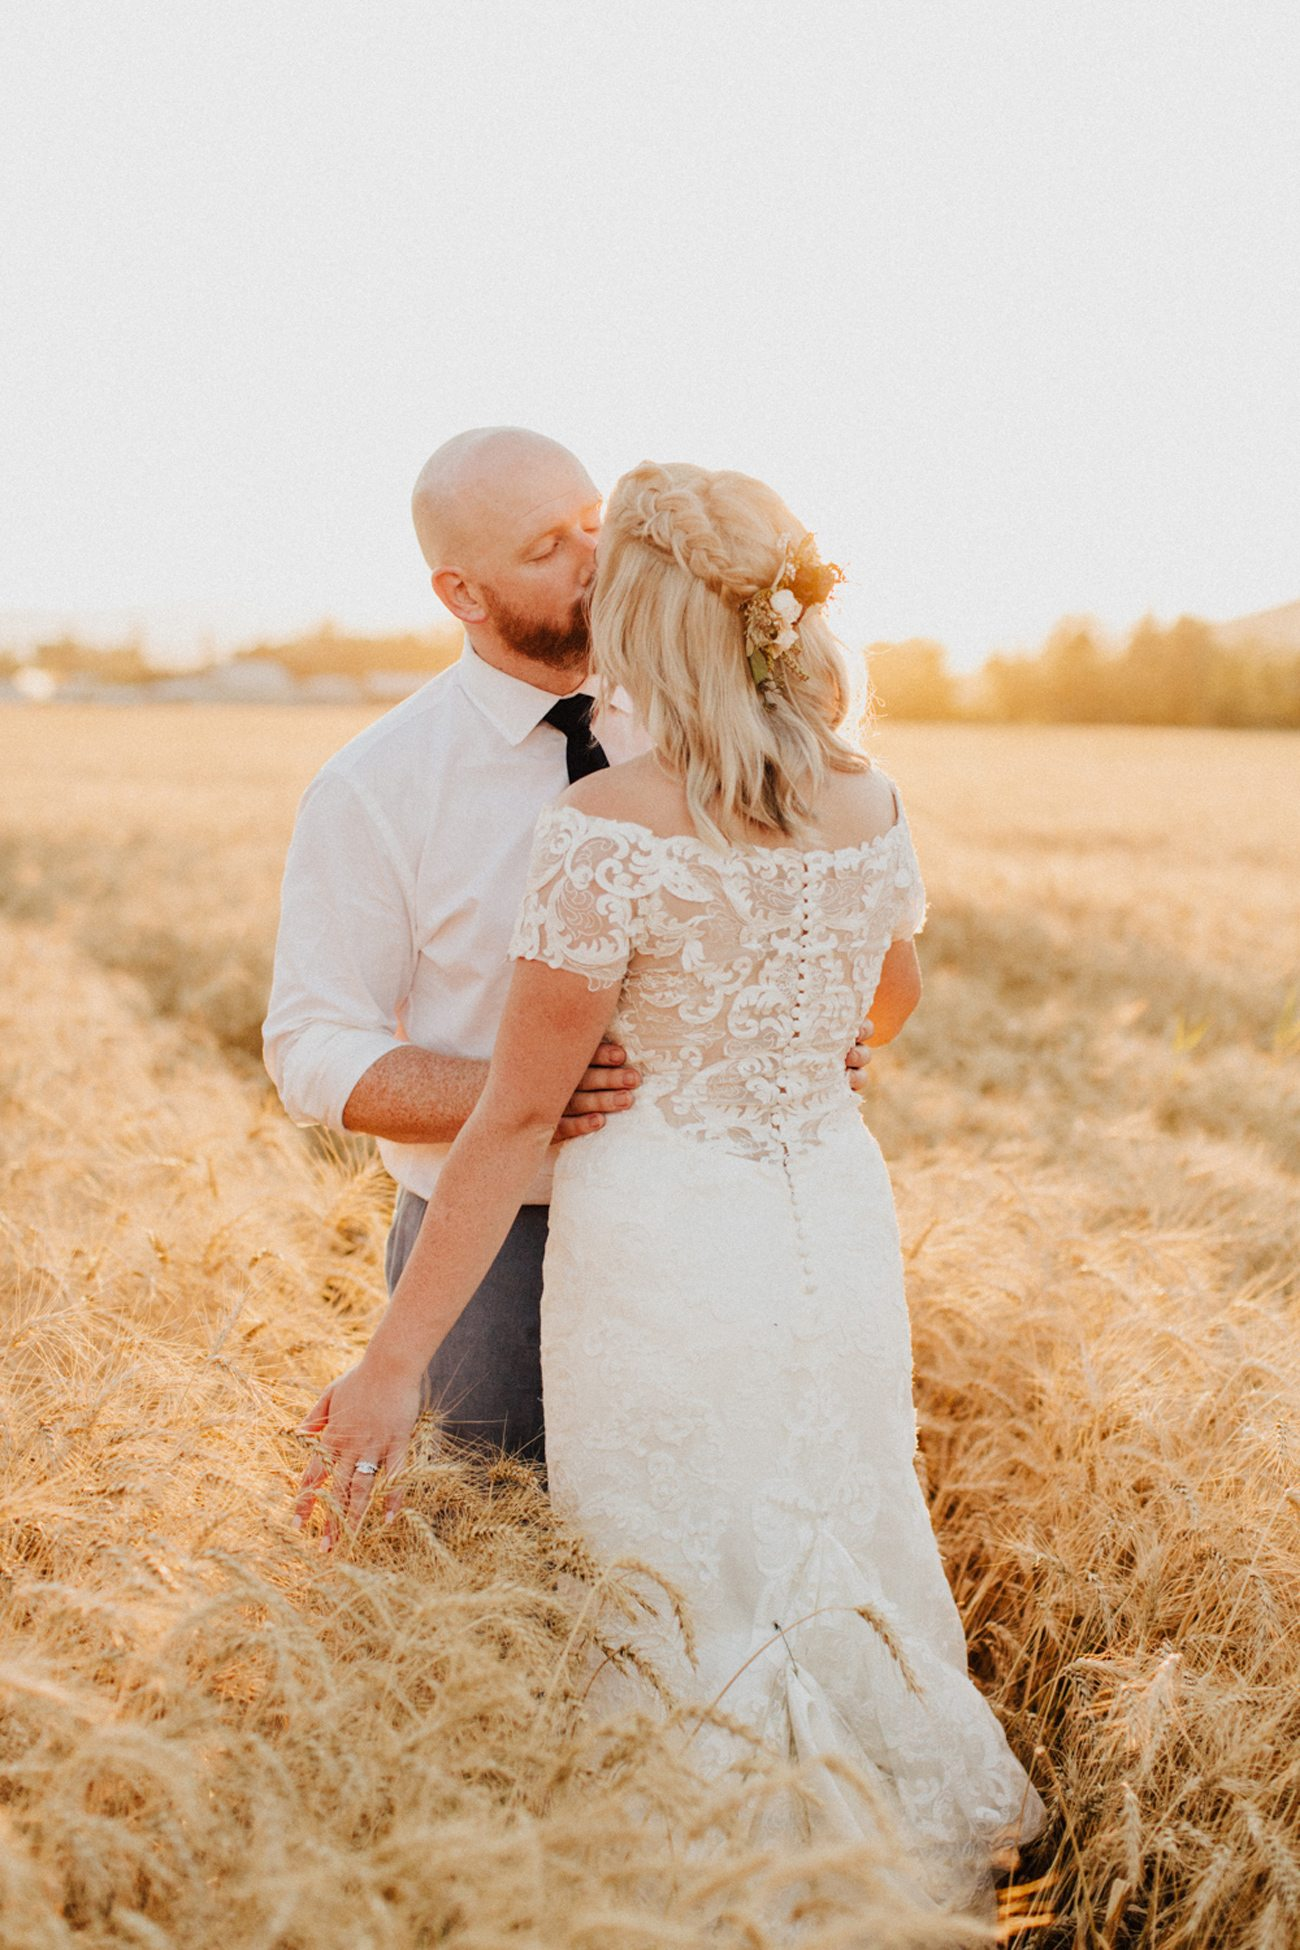 366-vernon-wedding-photographer